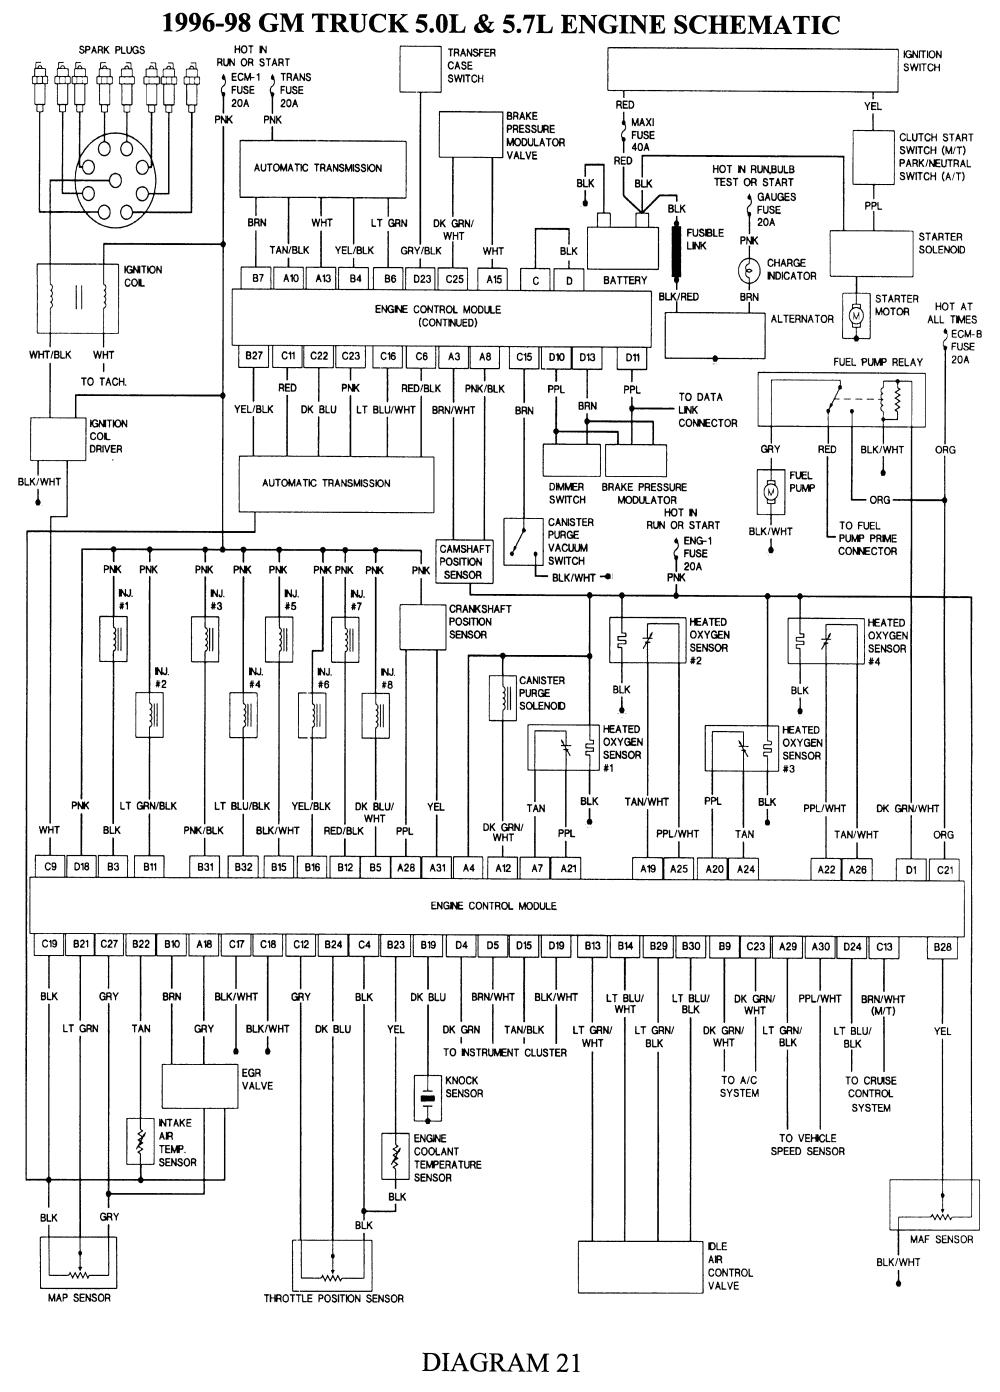 repair guides wiring diagrams wiring diagrams autozone com 88 98 chevy truck wiring diagram 98 chevy truck wiring diagram